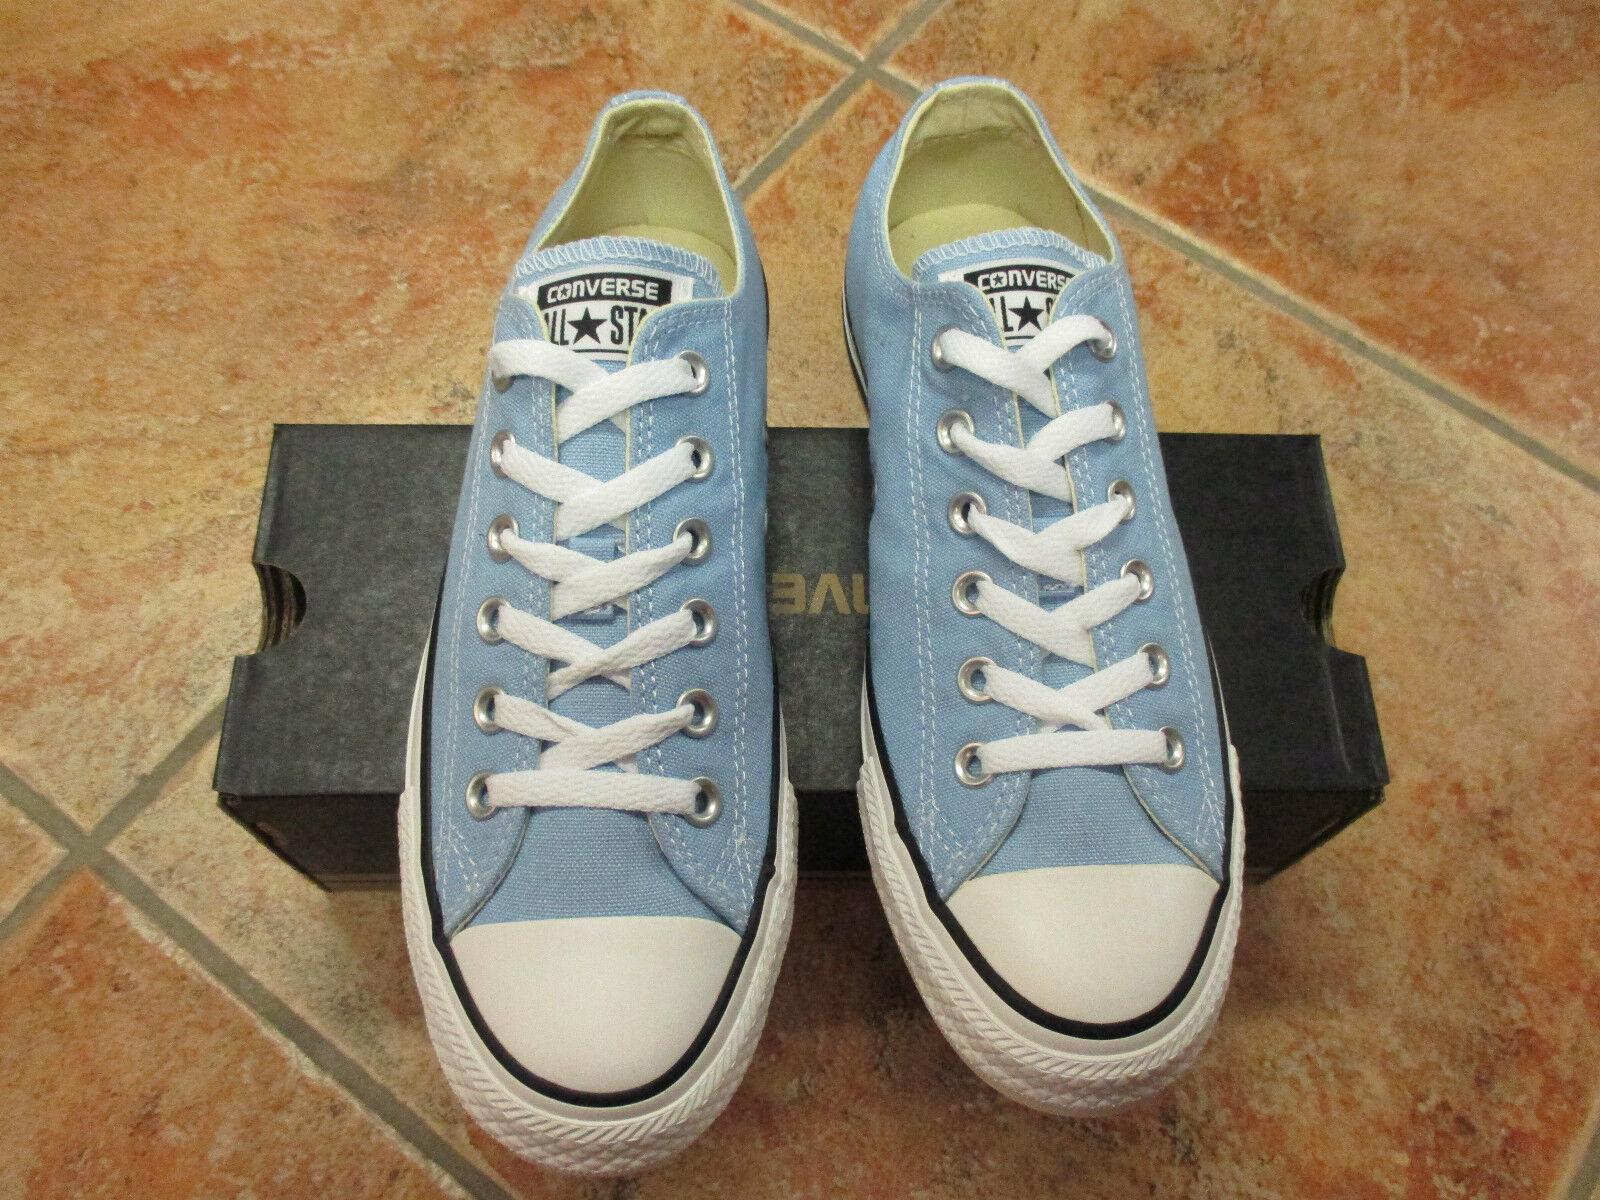 Converse Chucks All Star OX Gr. 37  Blau SKY / HELLBLAU NEU TOP